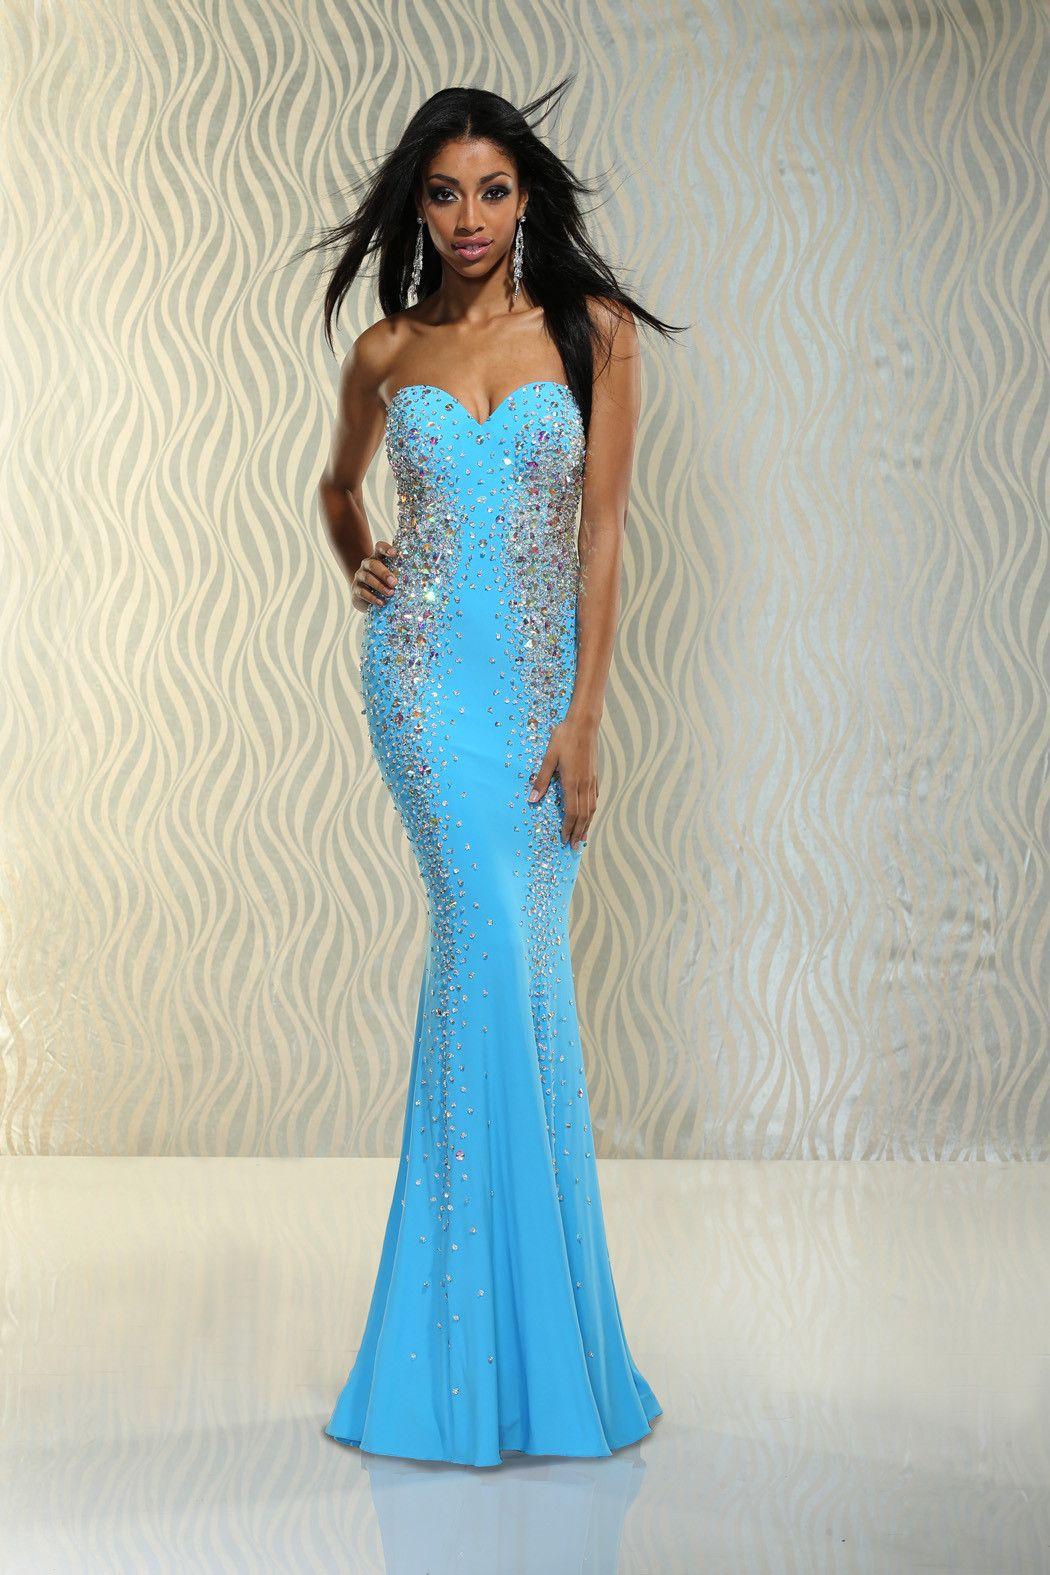 XCITE PROM 30590 | AMAZING DRESSES | Pinterest | Prom, Amazing ...